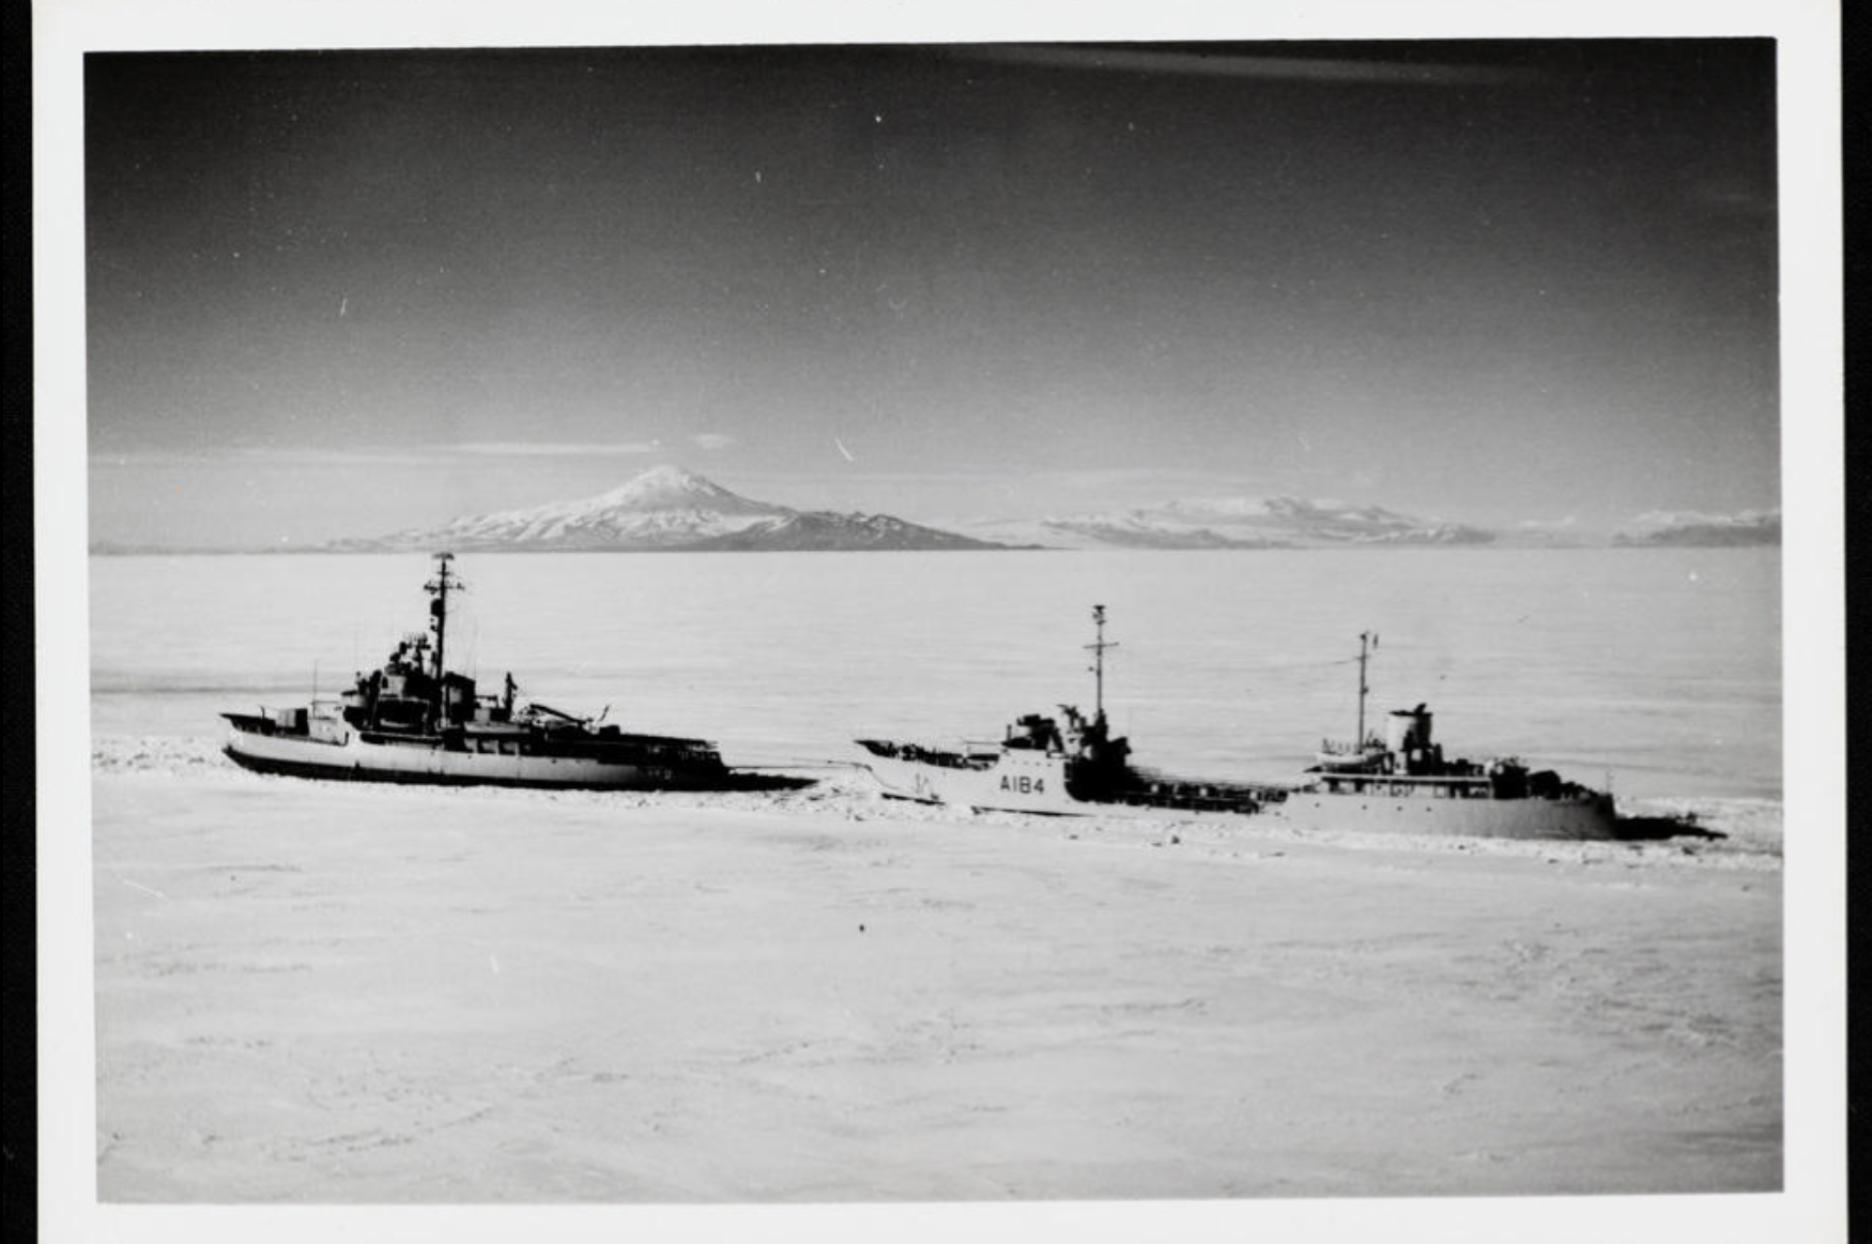 11829 1 The US Icebreaker 'Edisto' followed by H.M.N.Z.S. 'Endeavour II' in McMurdo Sound, Antarctica